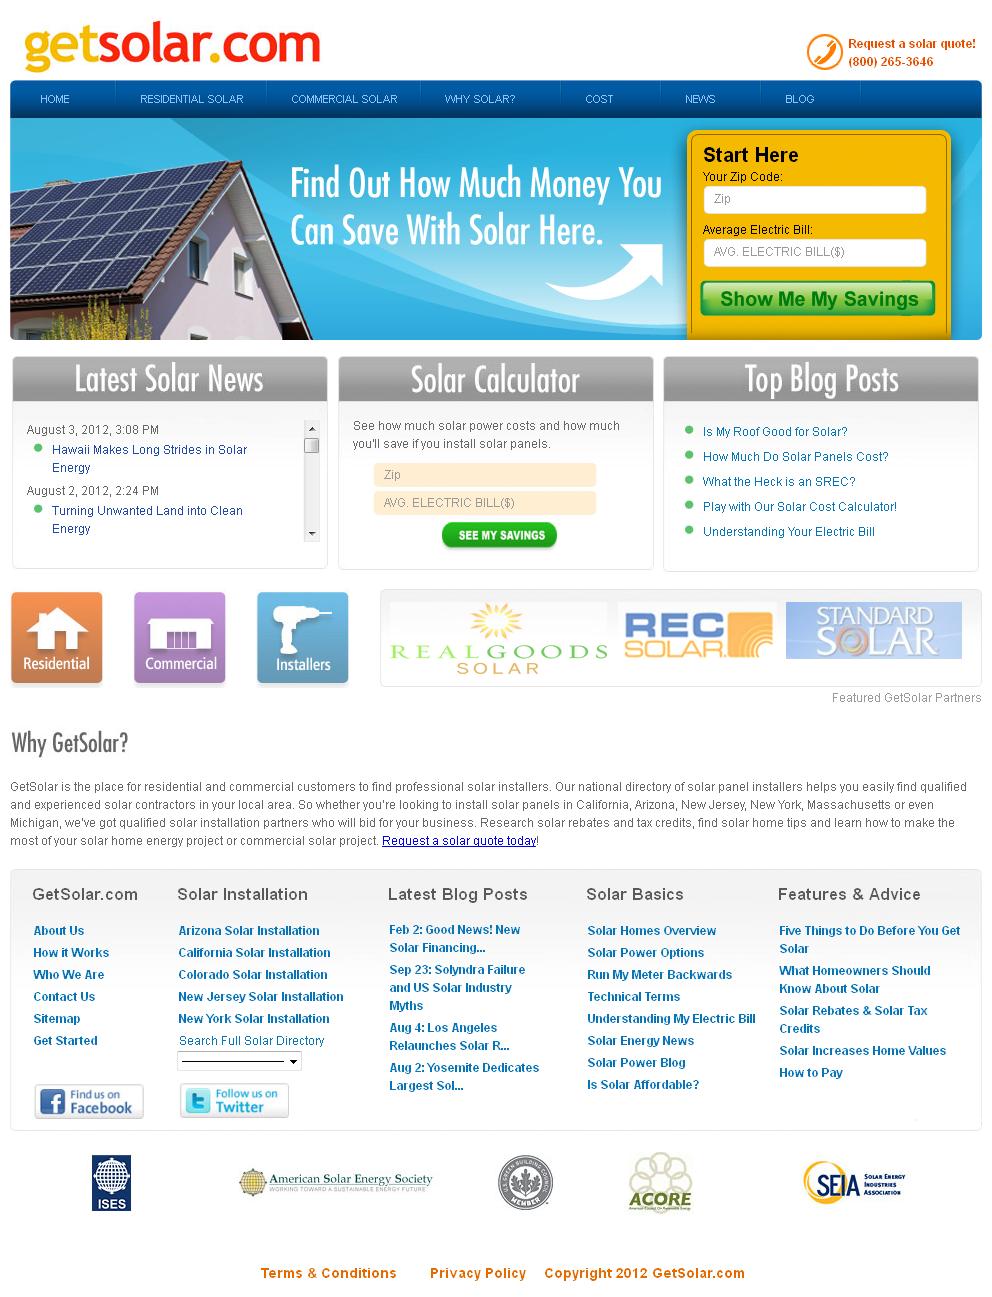 Website for Consumer 'Get Solar' Using PHP – Solar Panel Installer